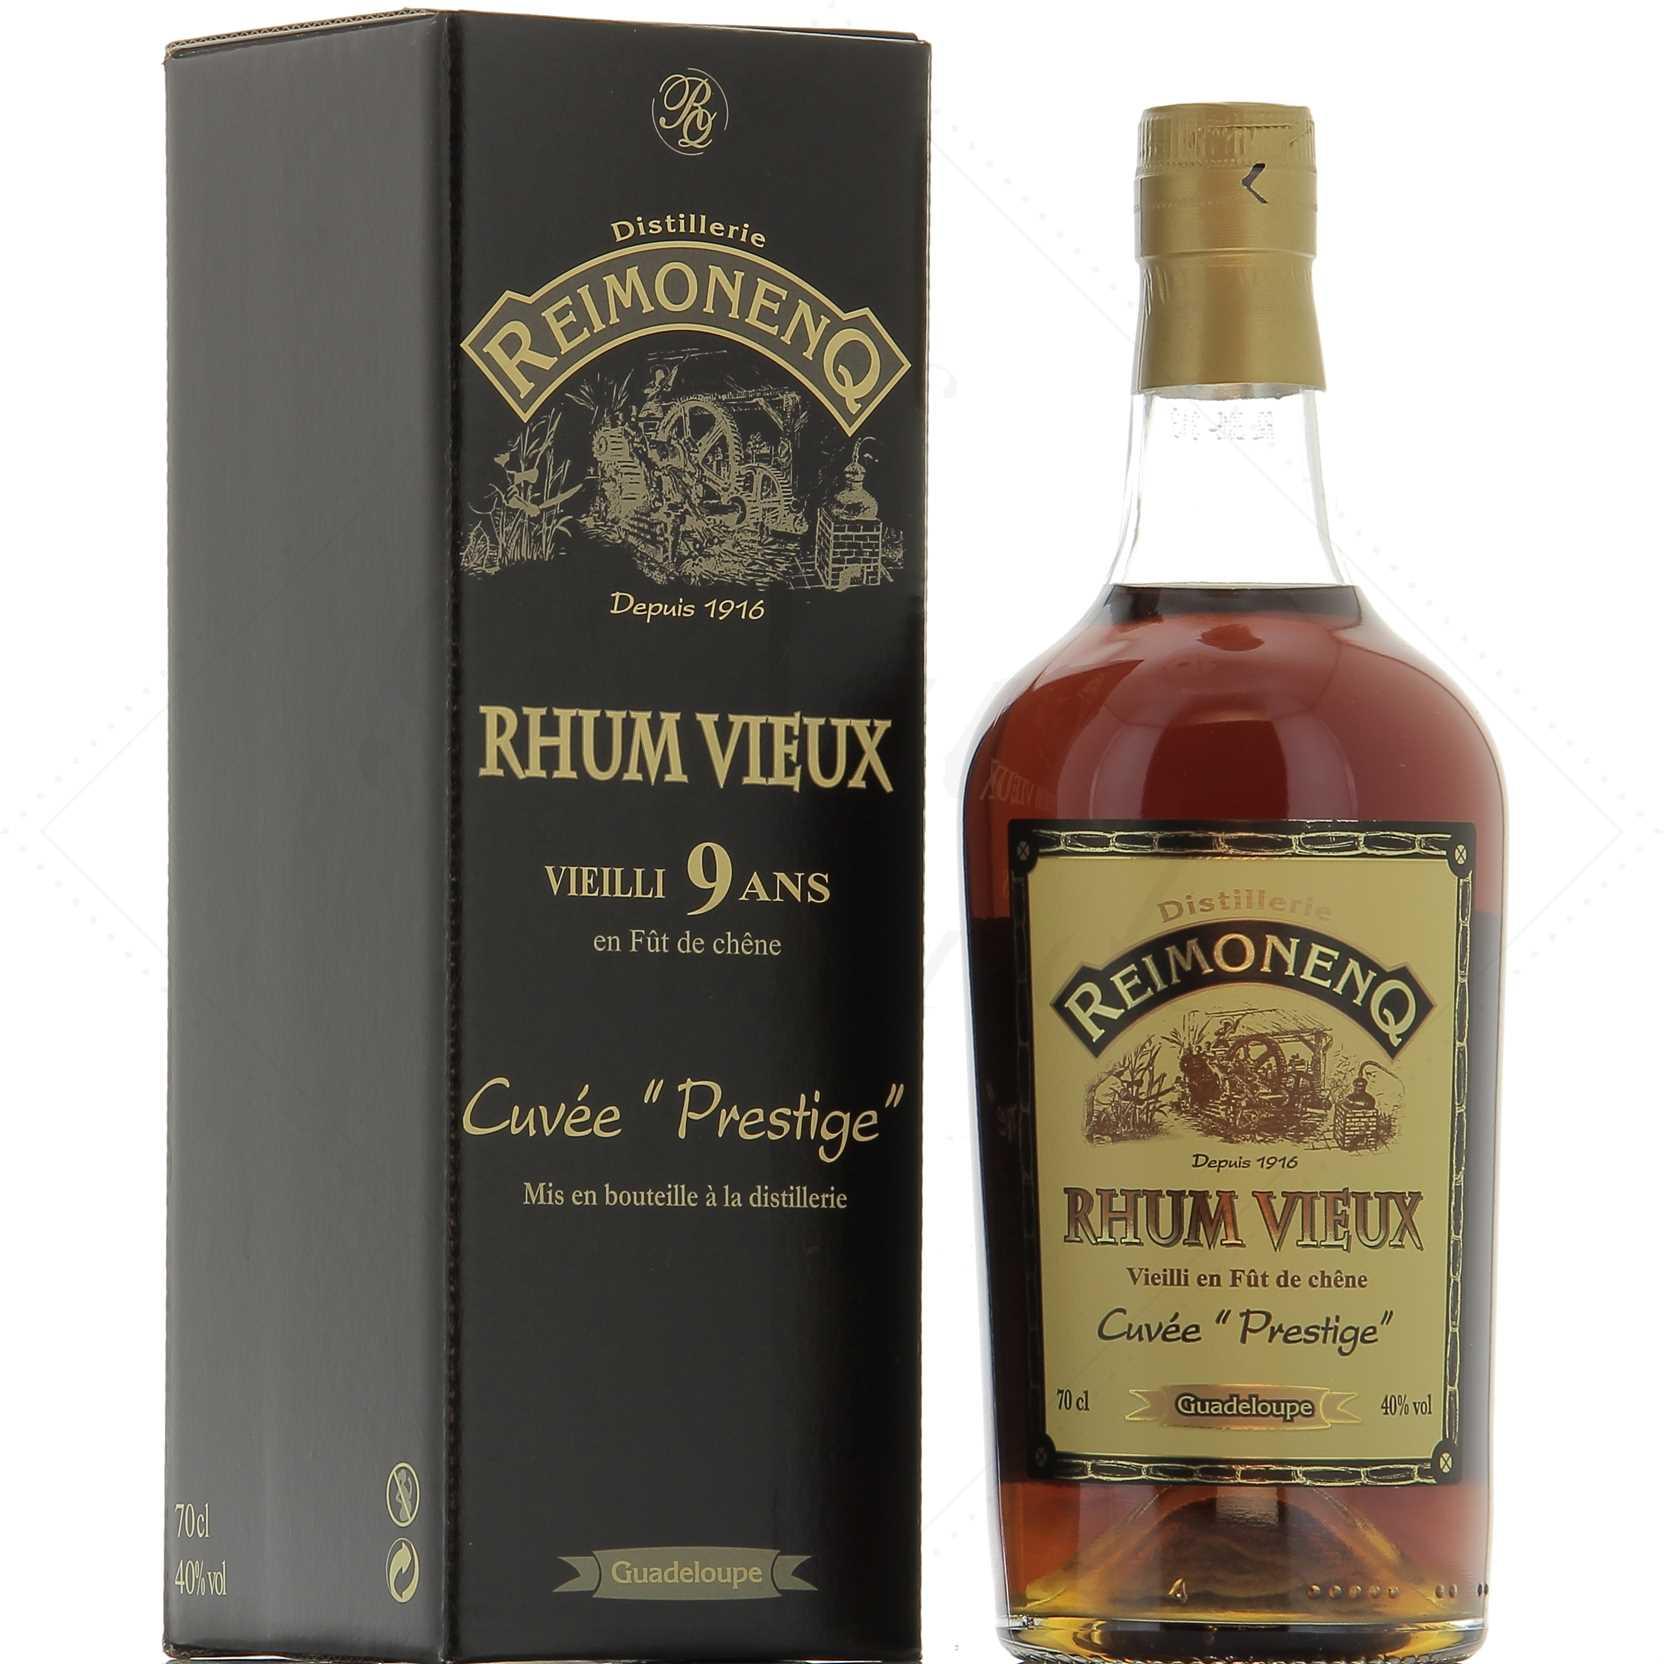 Distillato Rhum Agricole Vieux 9 Ans Cuveè Prestige Reimonenq